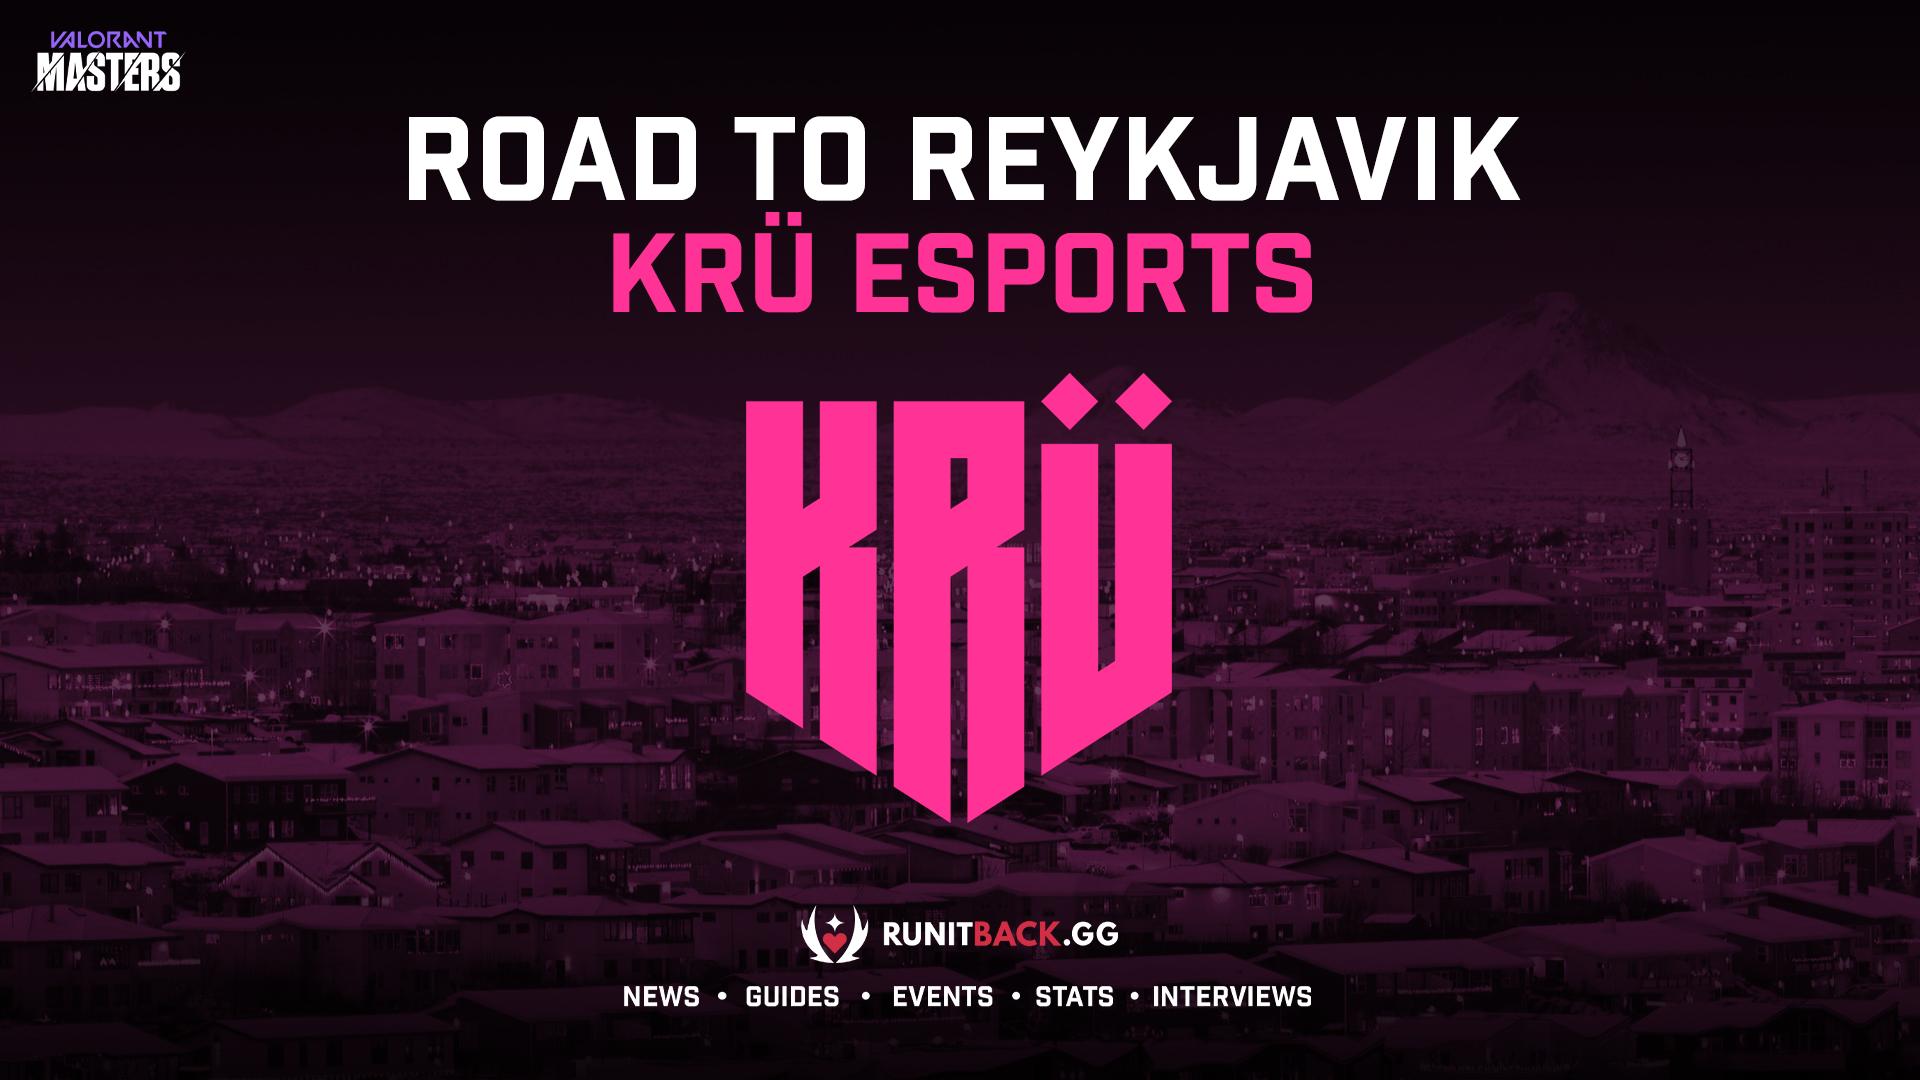 Road to Masters Reykjavik – KRÜ Esports